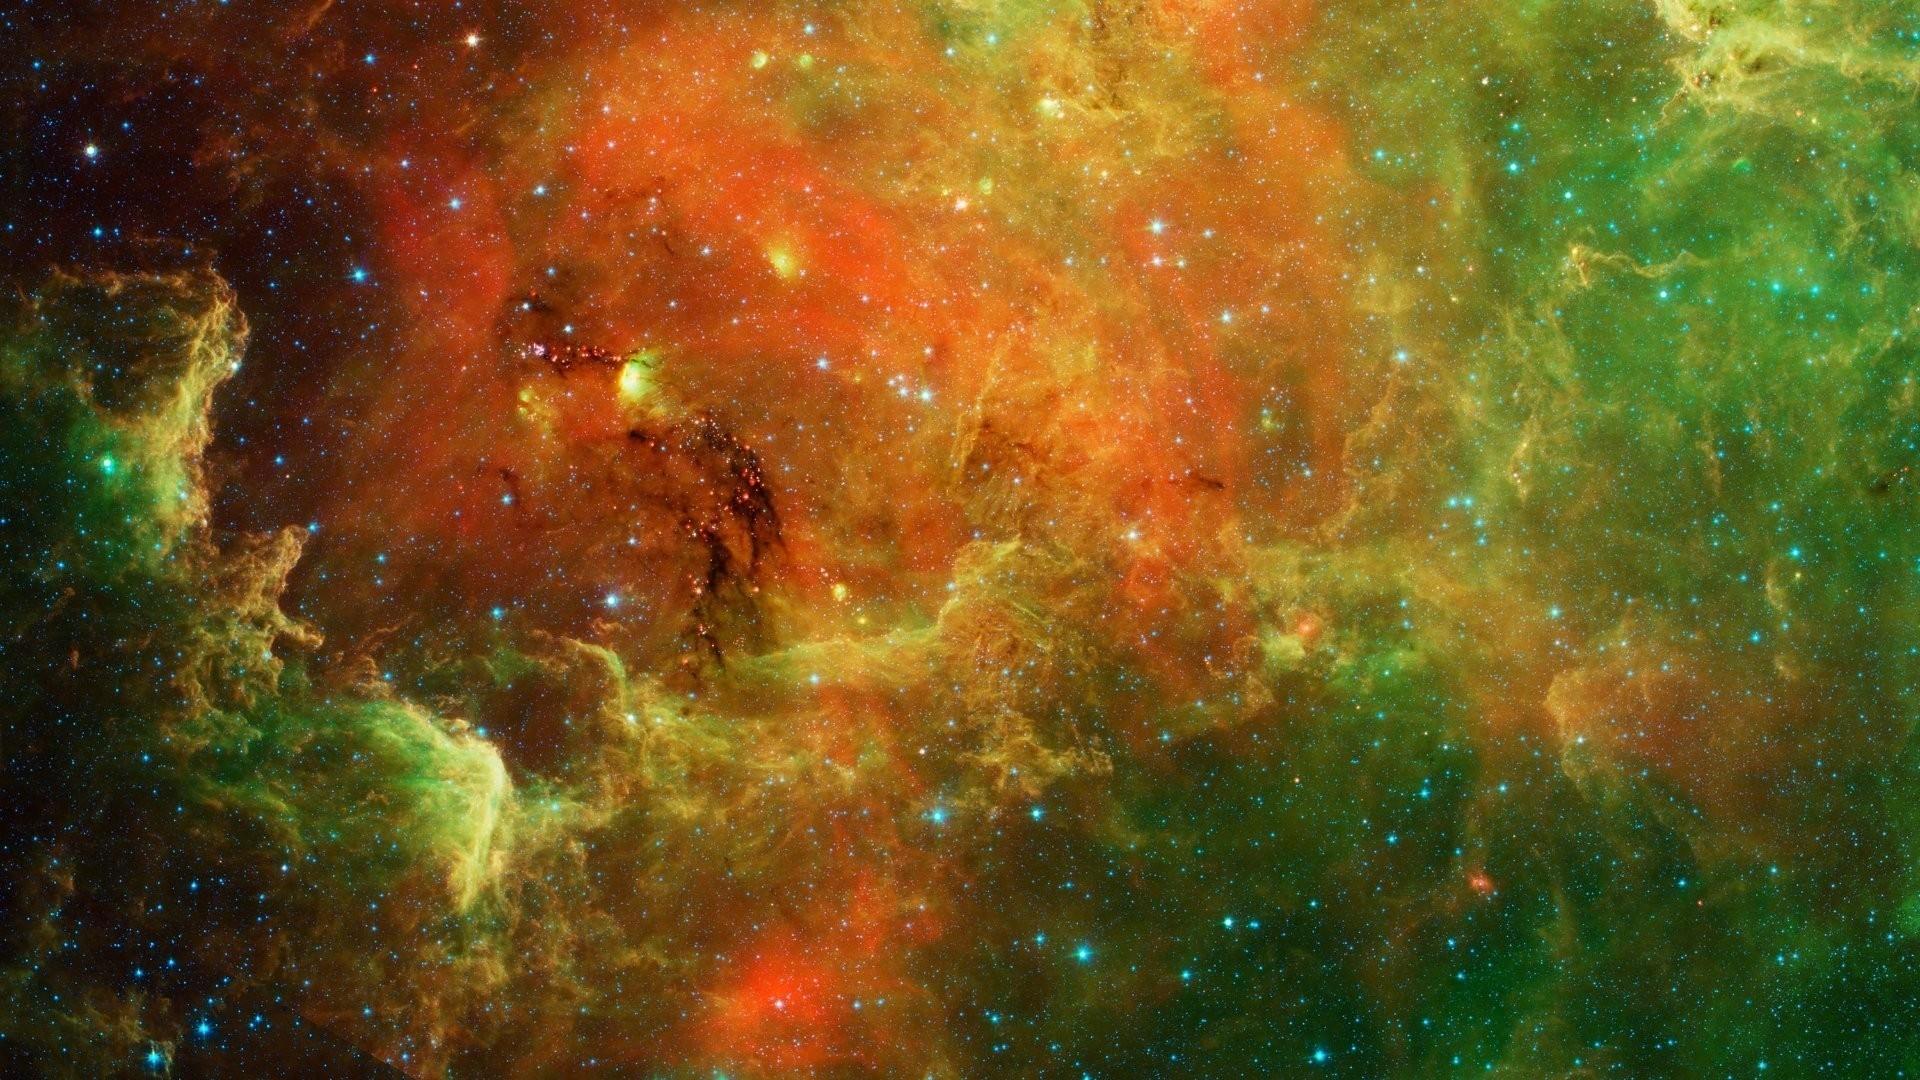 Outer space stars galaxies nasa hubble nebula wallpaper     85389    WallpaperUP